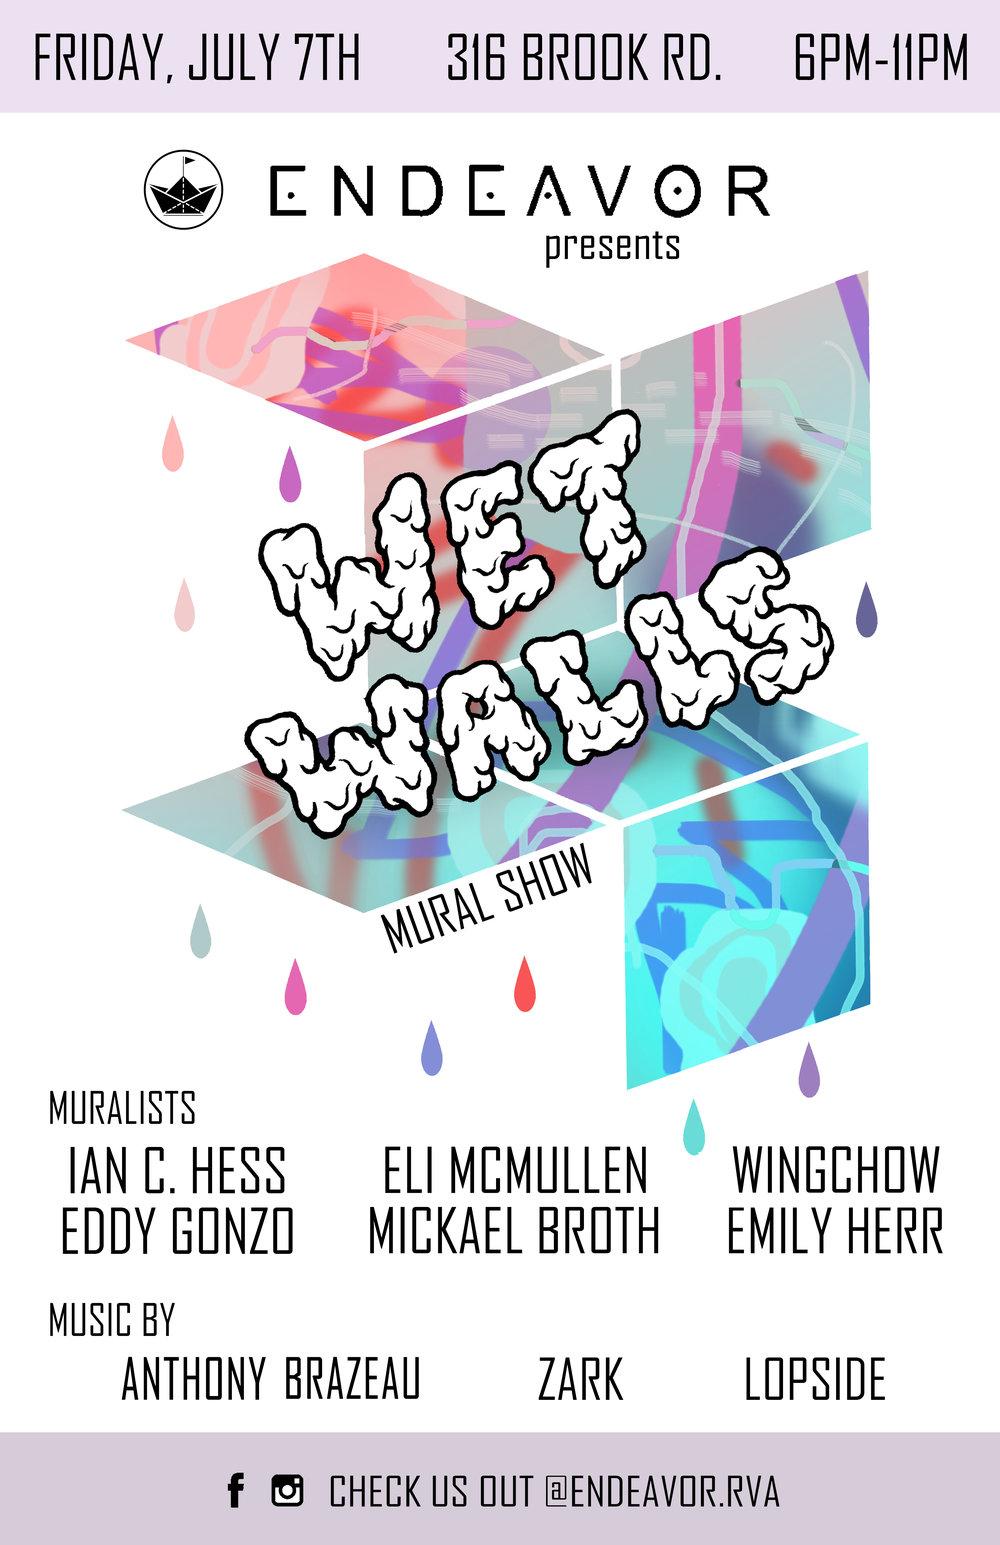 Wet Walls Mural Show